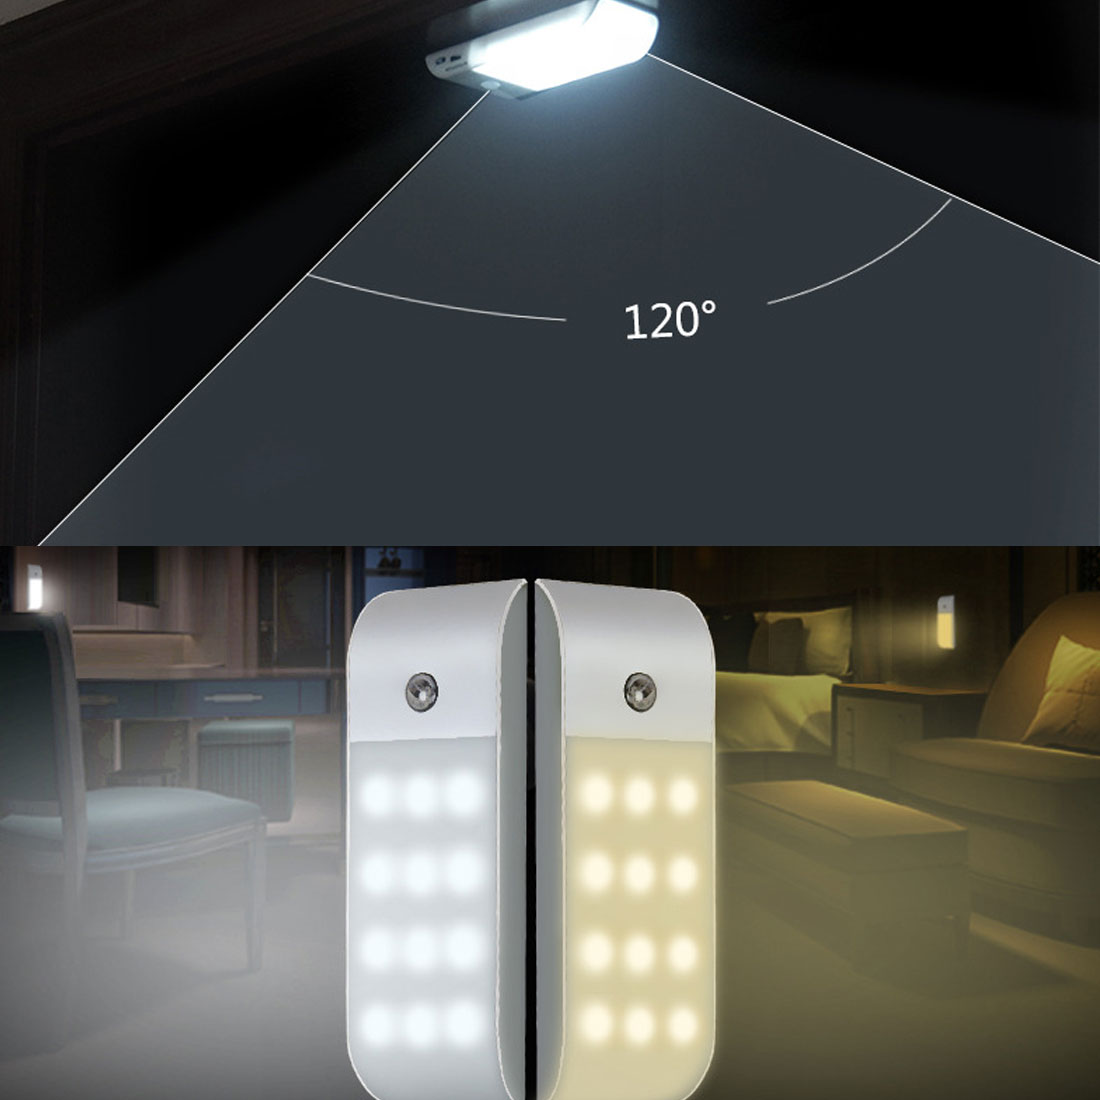 LED USB PIR Infrared Motion Sensor USB Rechargeable 12 LED Nightlight Light Induction Corridor Closet Wardrobe Night Lamp